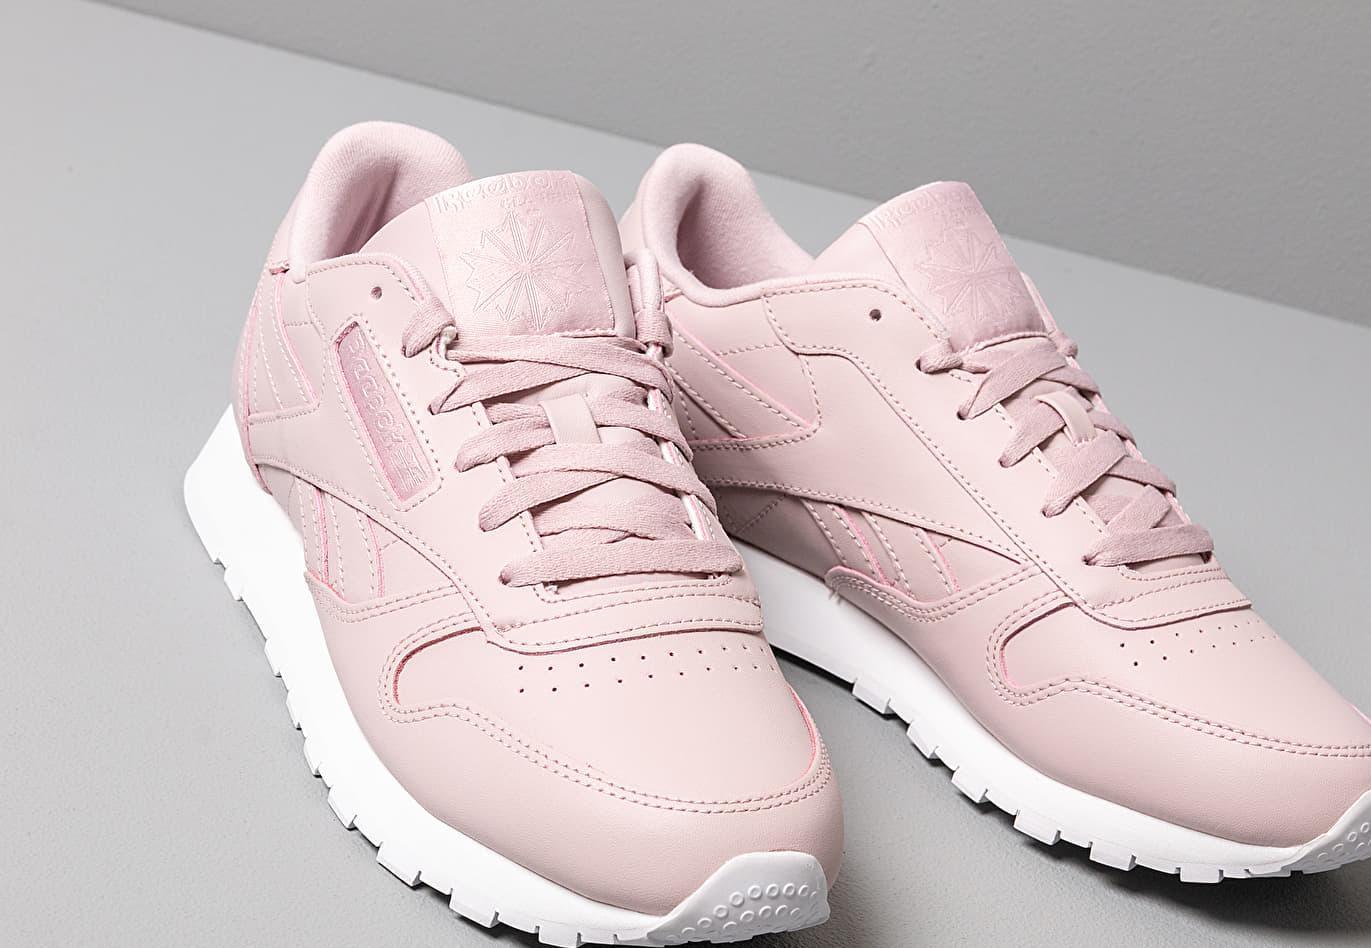 70521798ee593 Reebok - Pink Leather Ashen Lilac  White - Lyst. View fullscreen